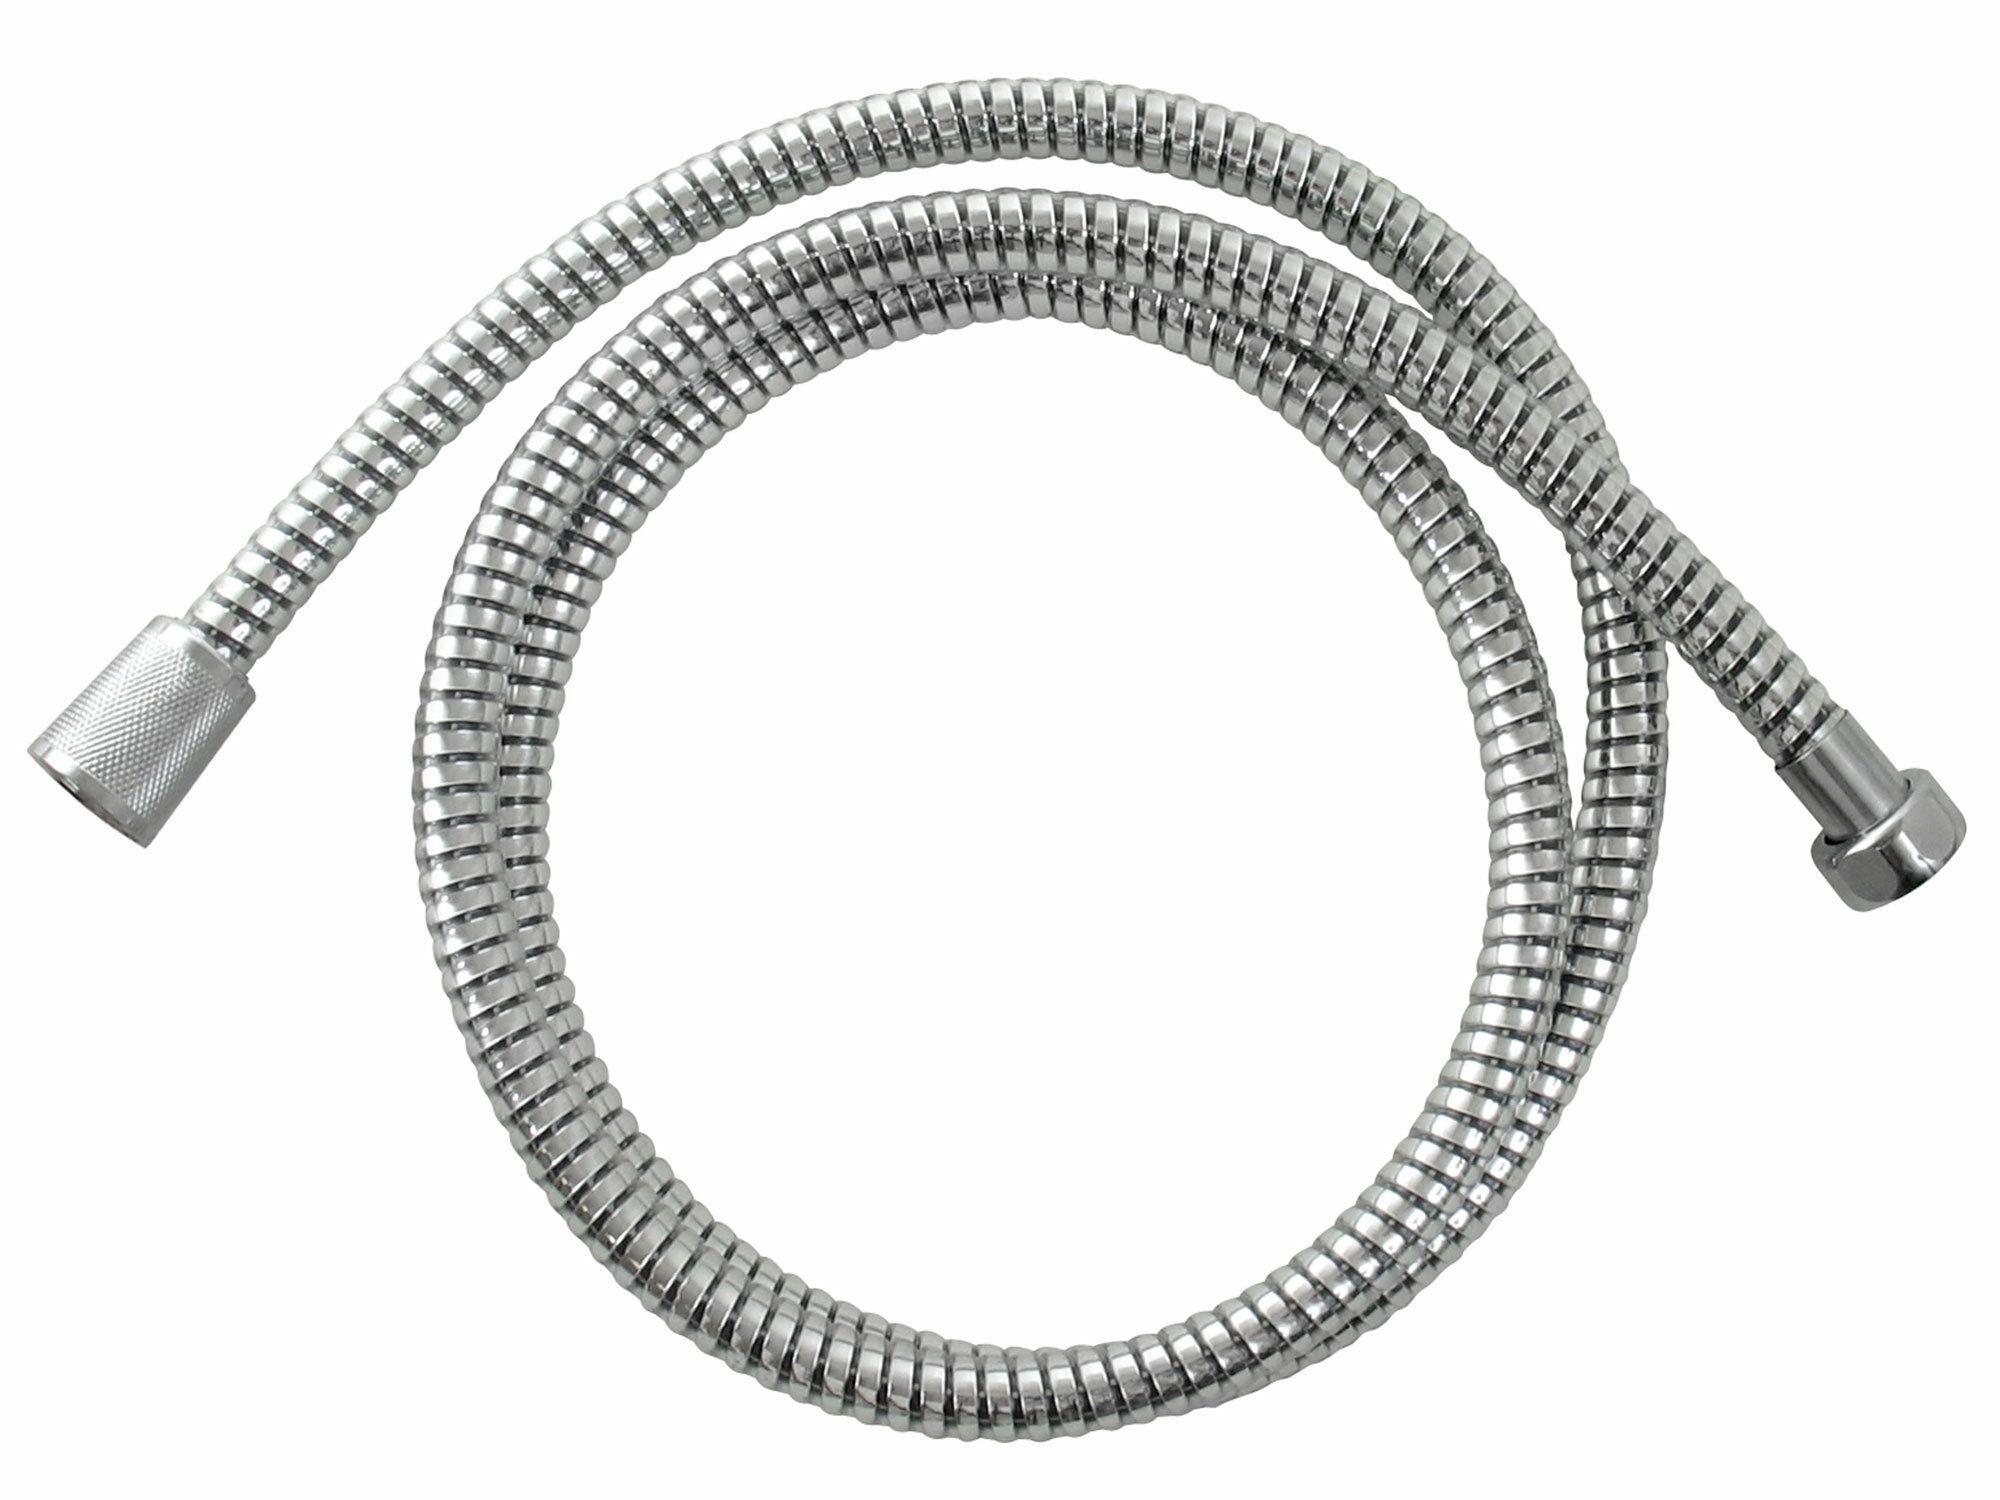 Hadice sprchová, stříbrná, 150cm, PVC BALLETTO